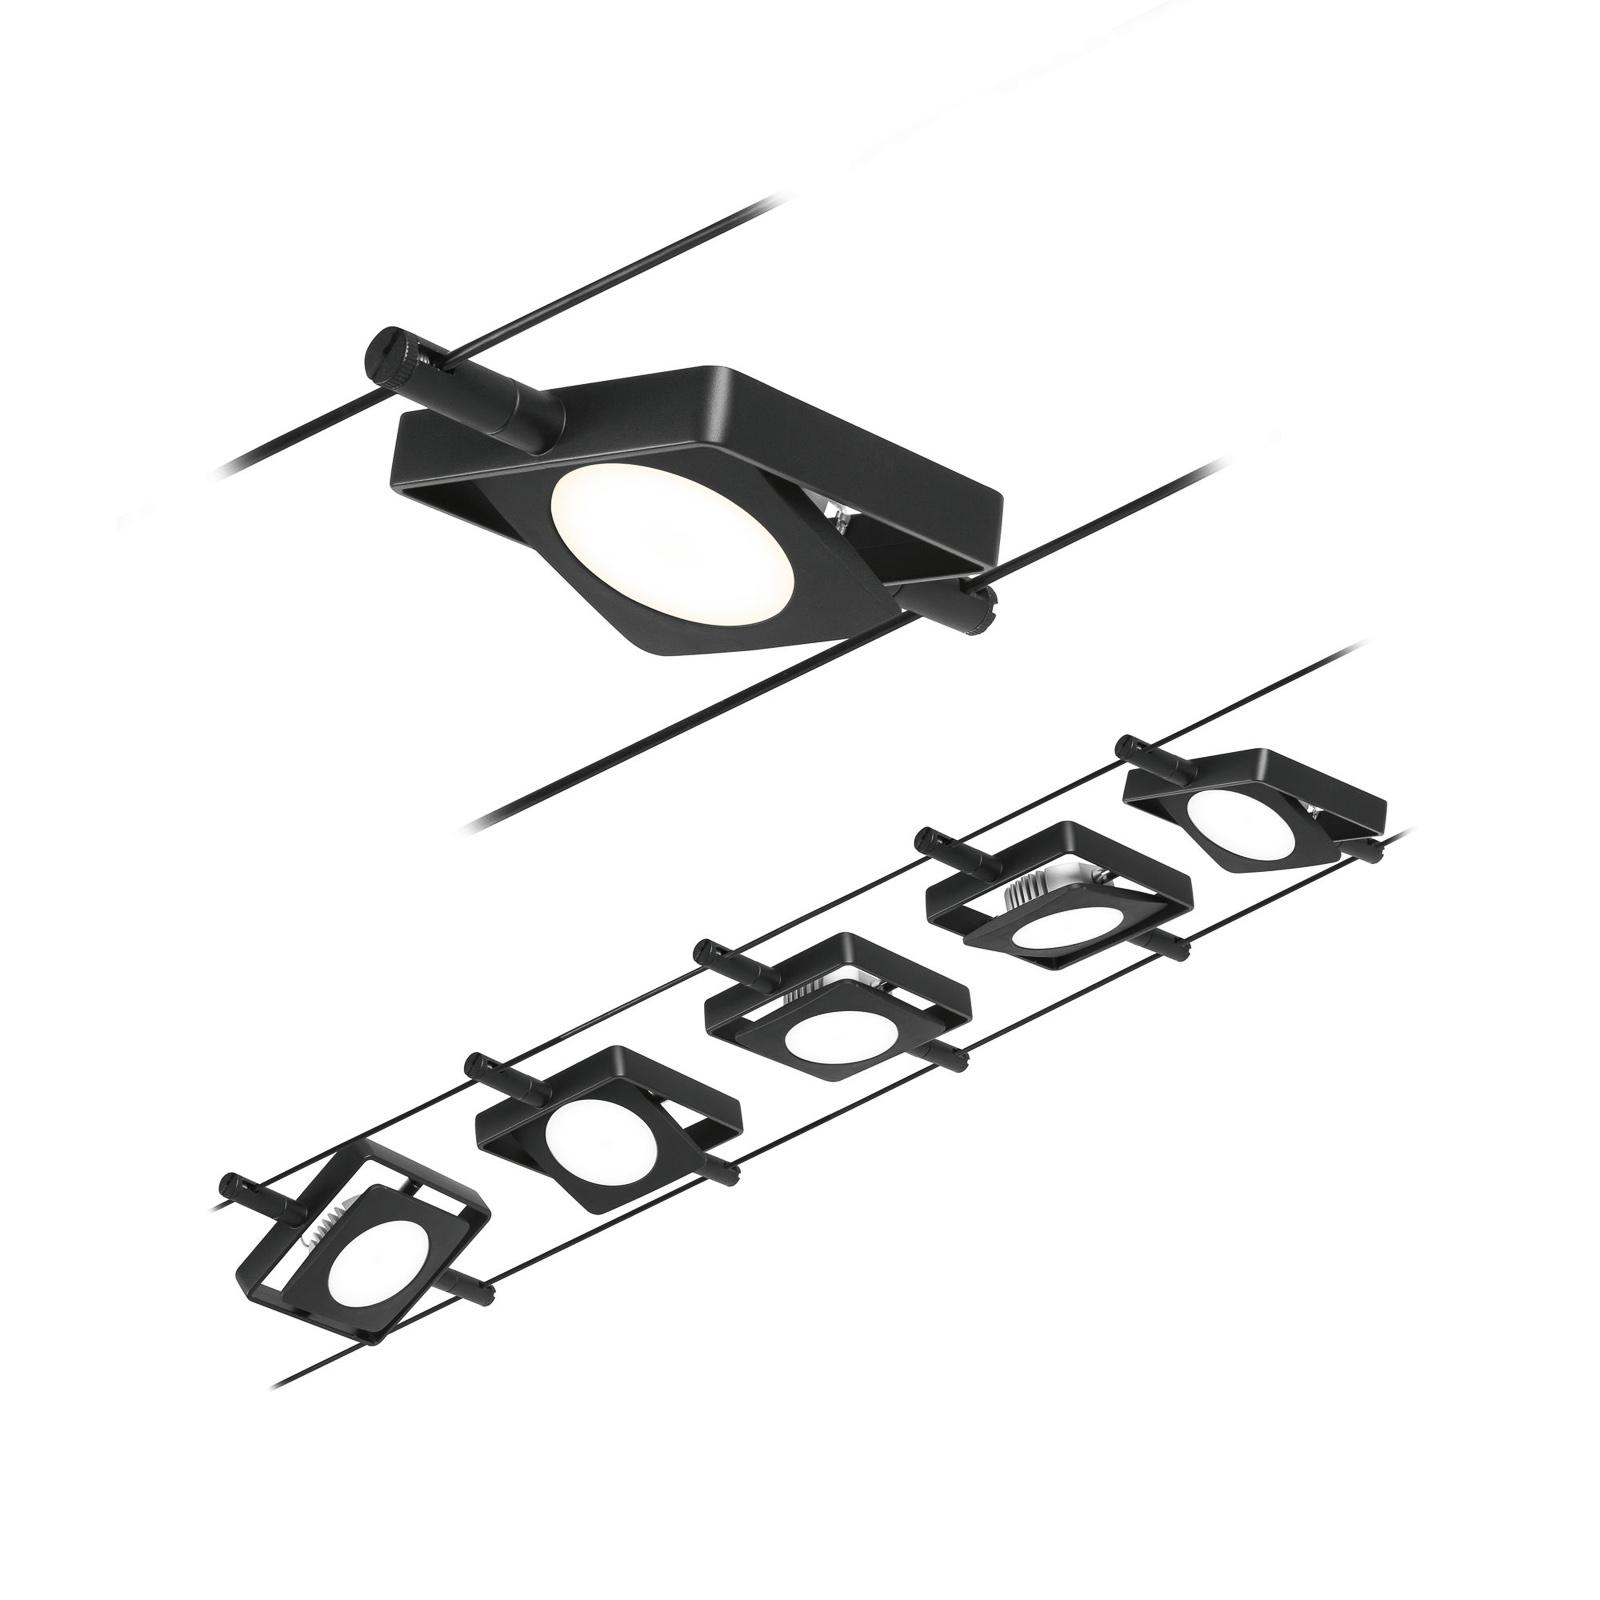 Paulmann Wire MacLED LED-Seilsystem,5-fl. schwarz